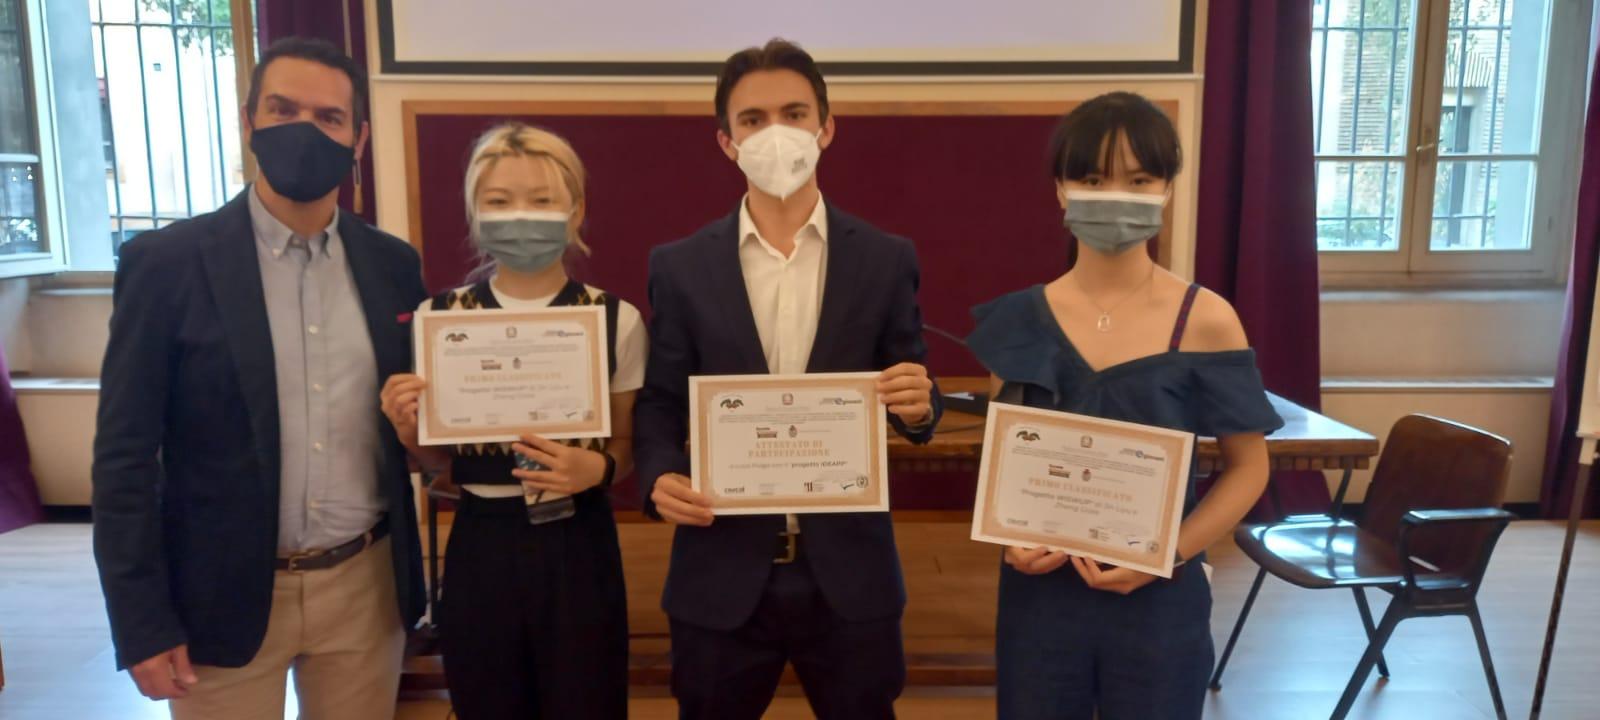 premio scuola d'impresa challenge 2021